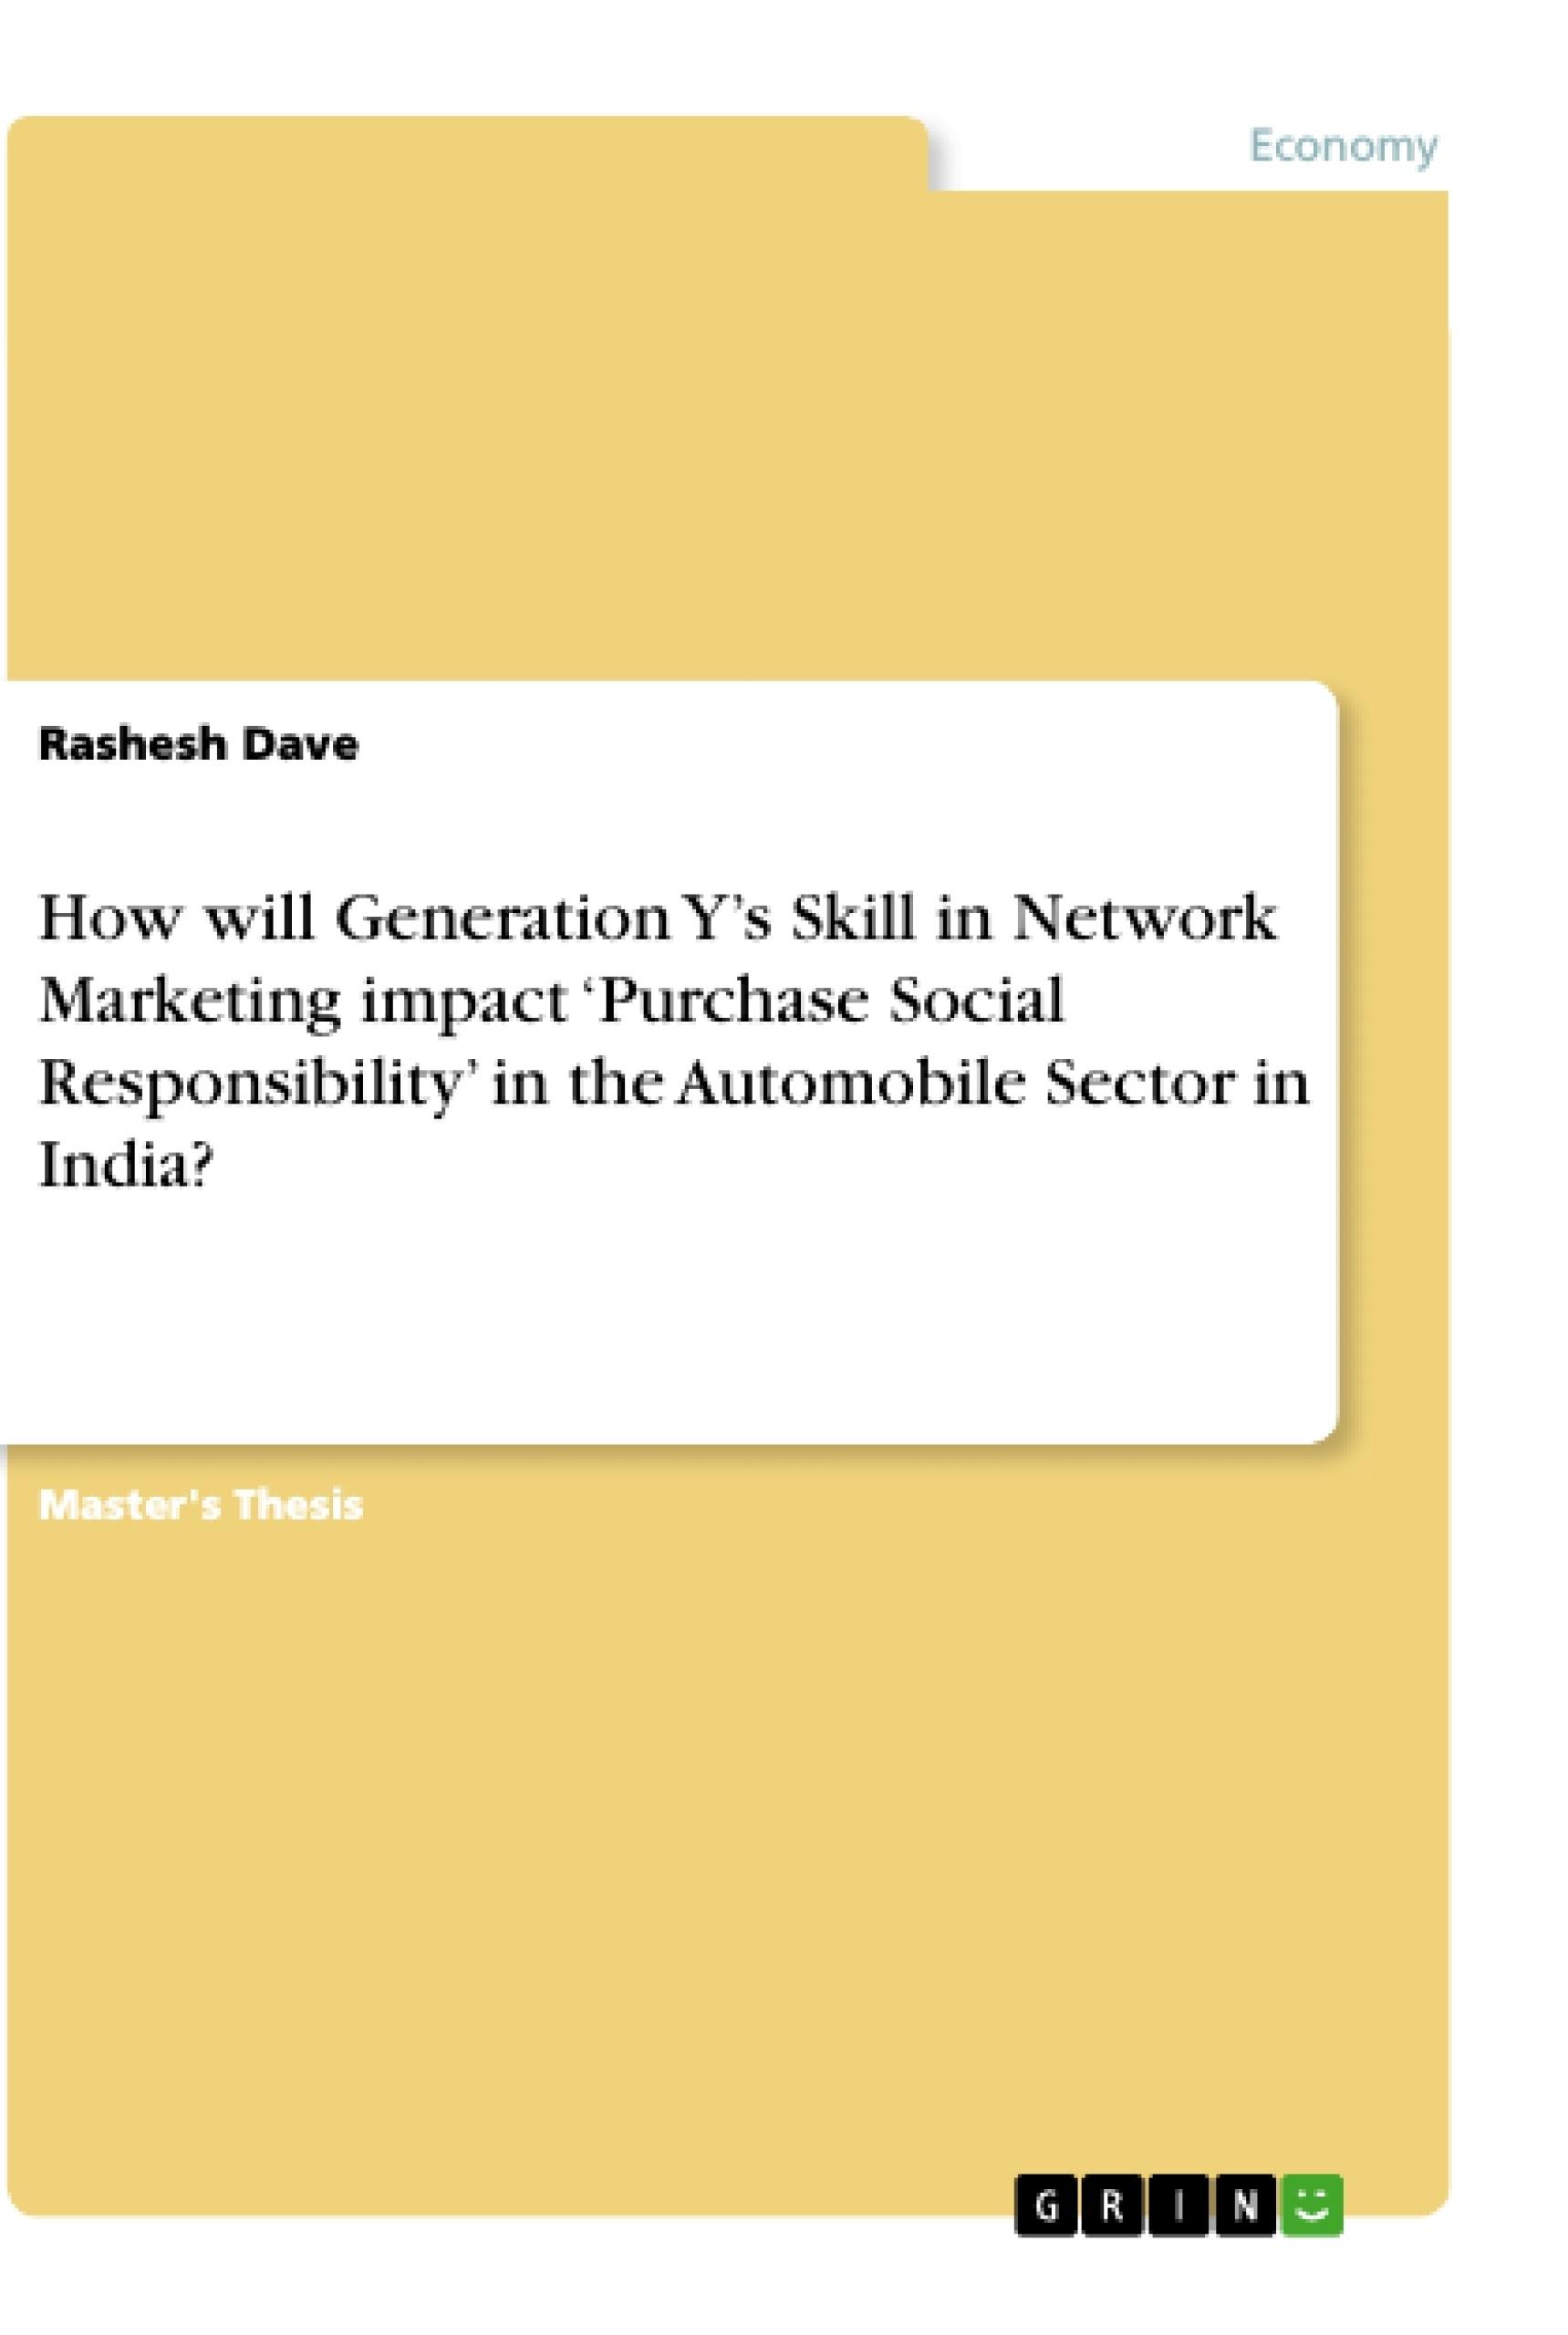 corporate network management essay